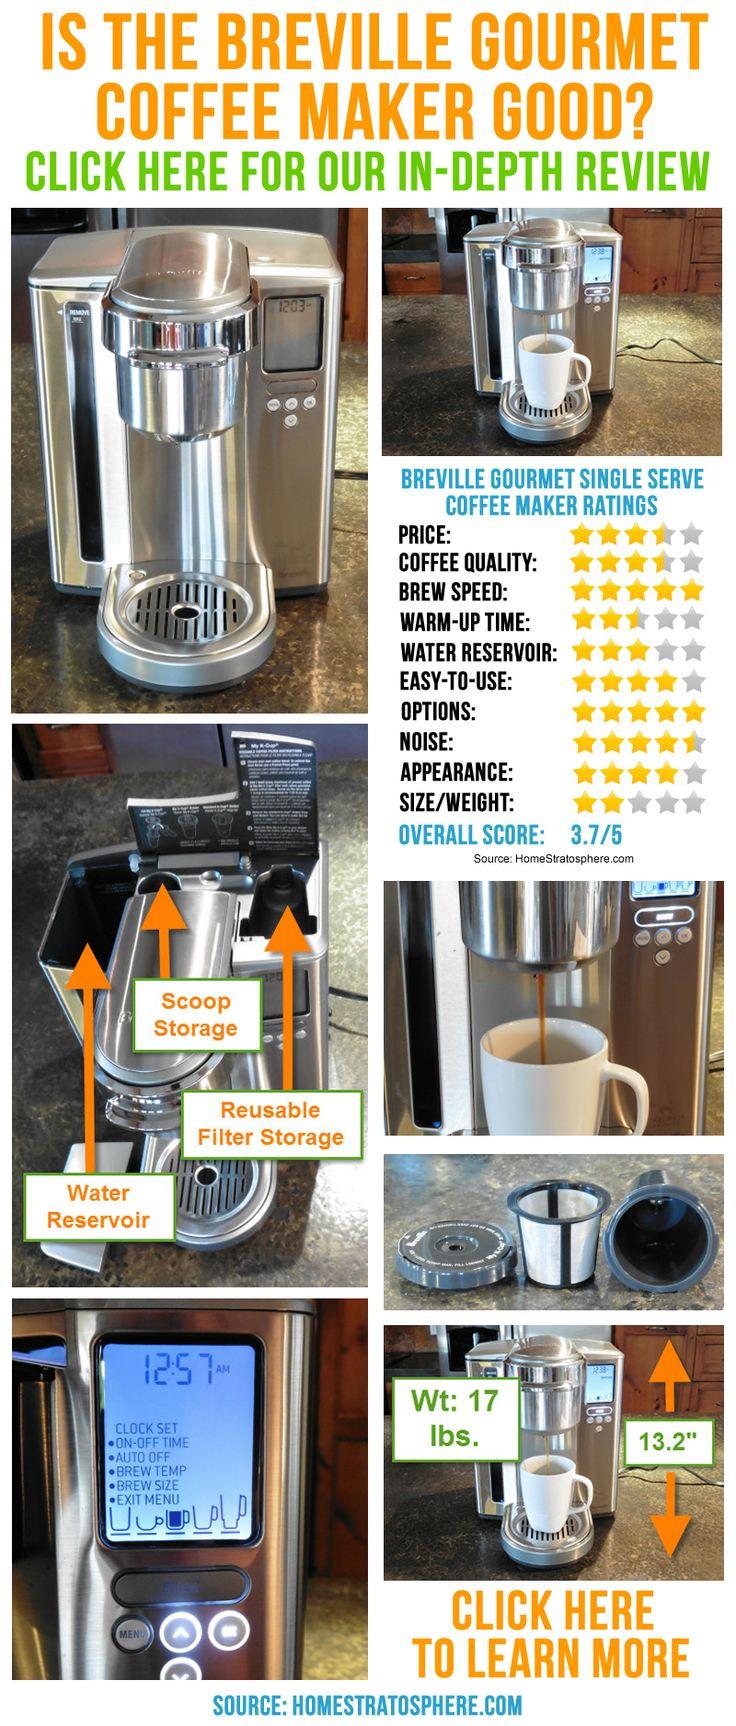 Breville Gourmet Single Serve Coffee Maker Review (bkc700xl)